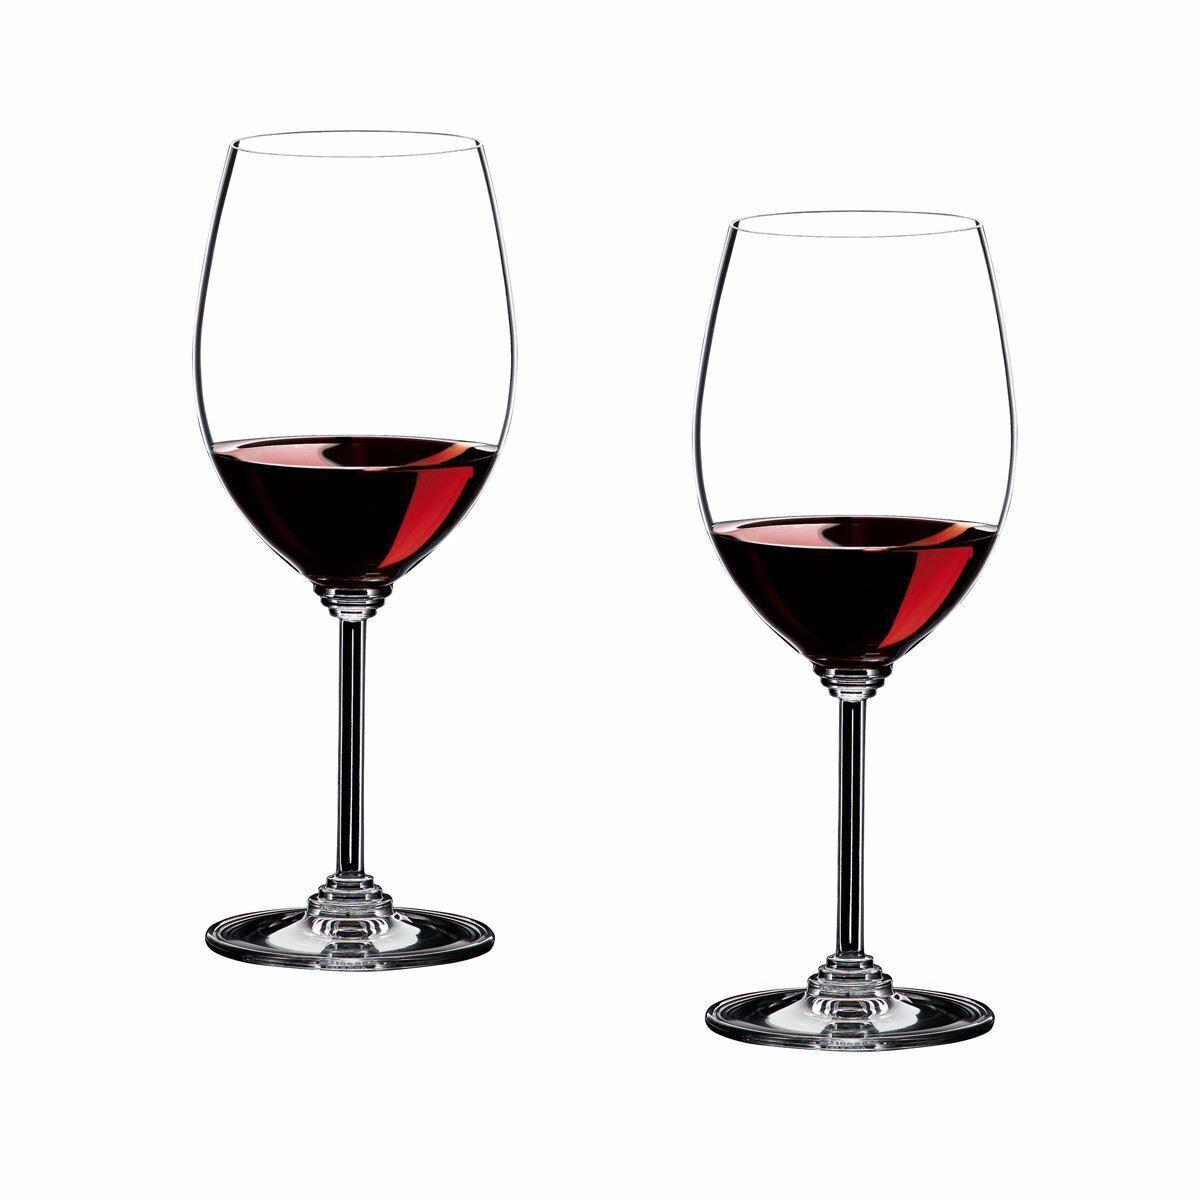 Riedel Wine Cabernet Merlot Glass Pair